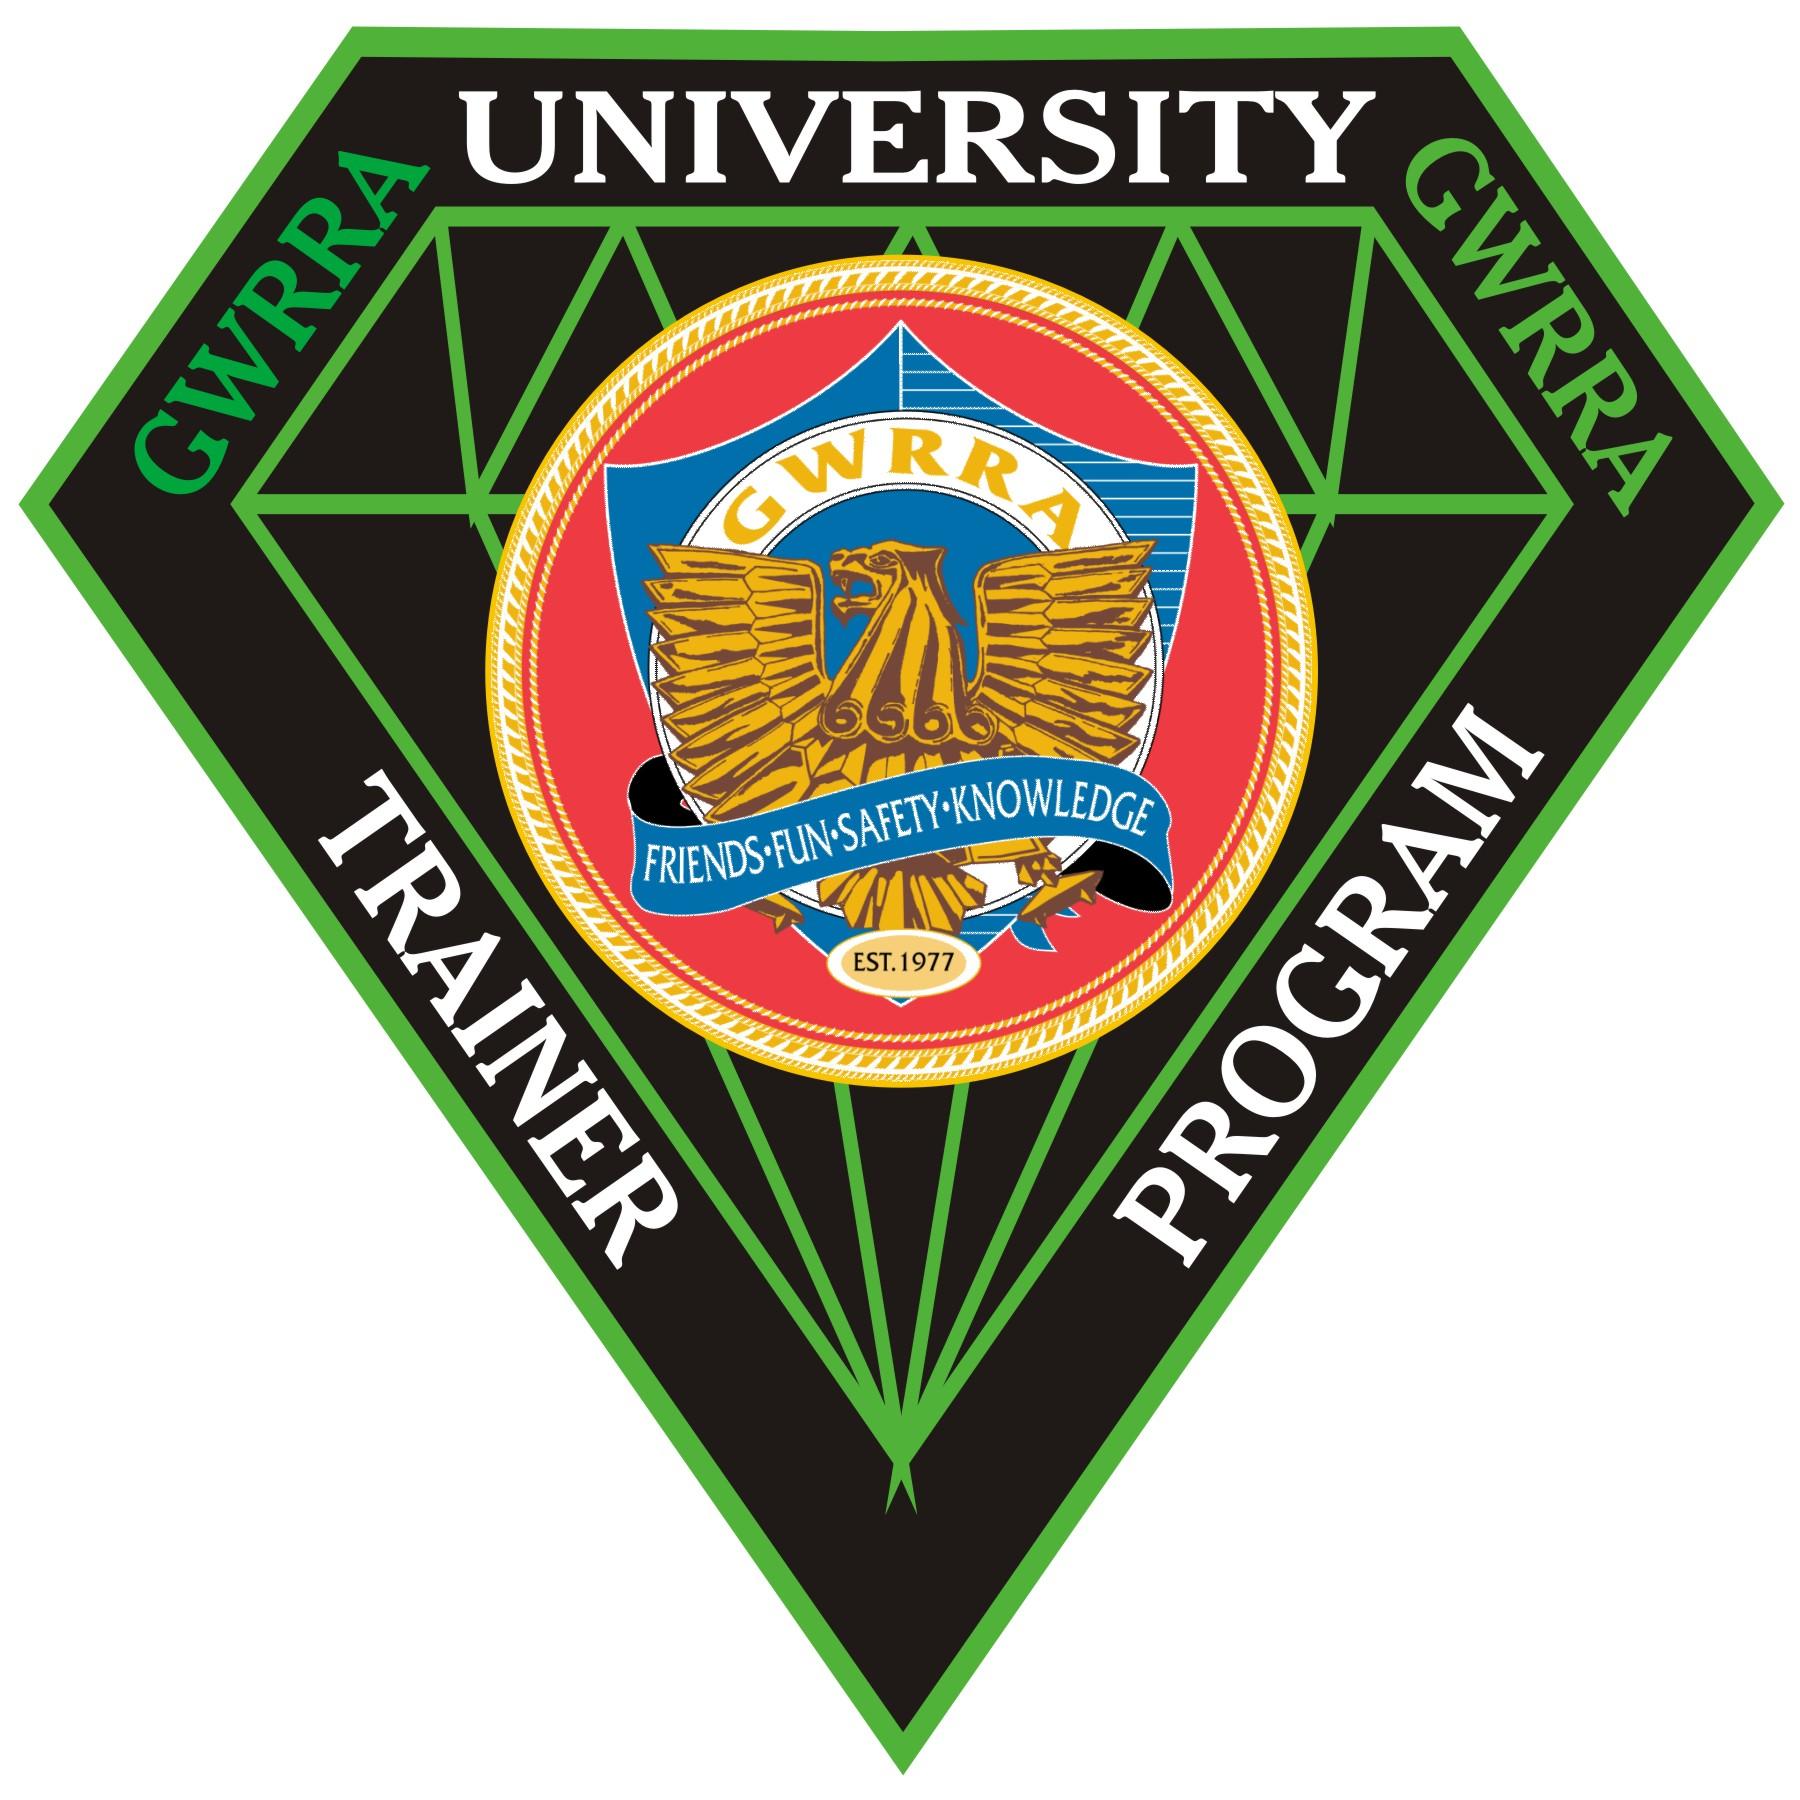 GWRRA_University_Diamond